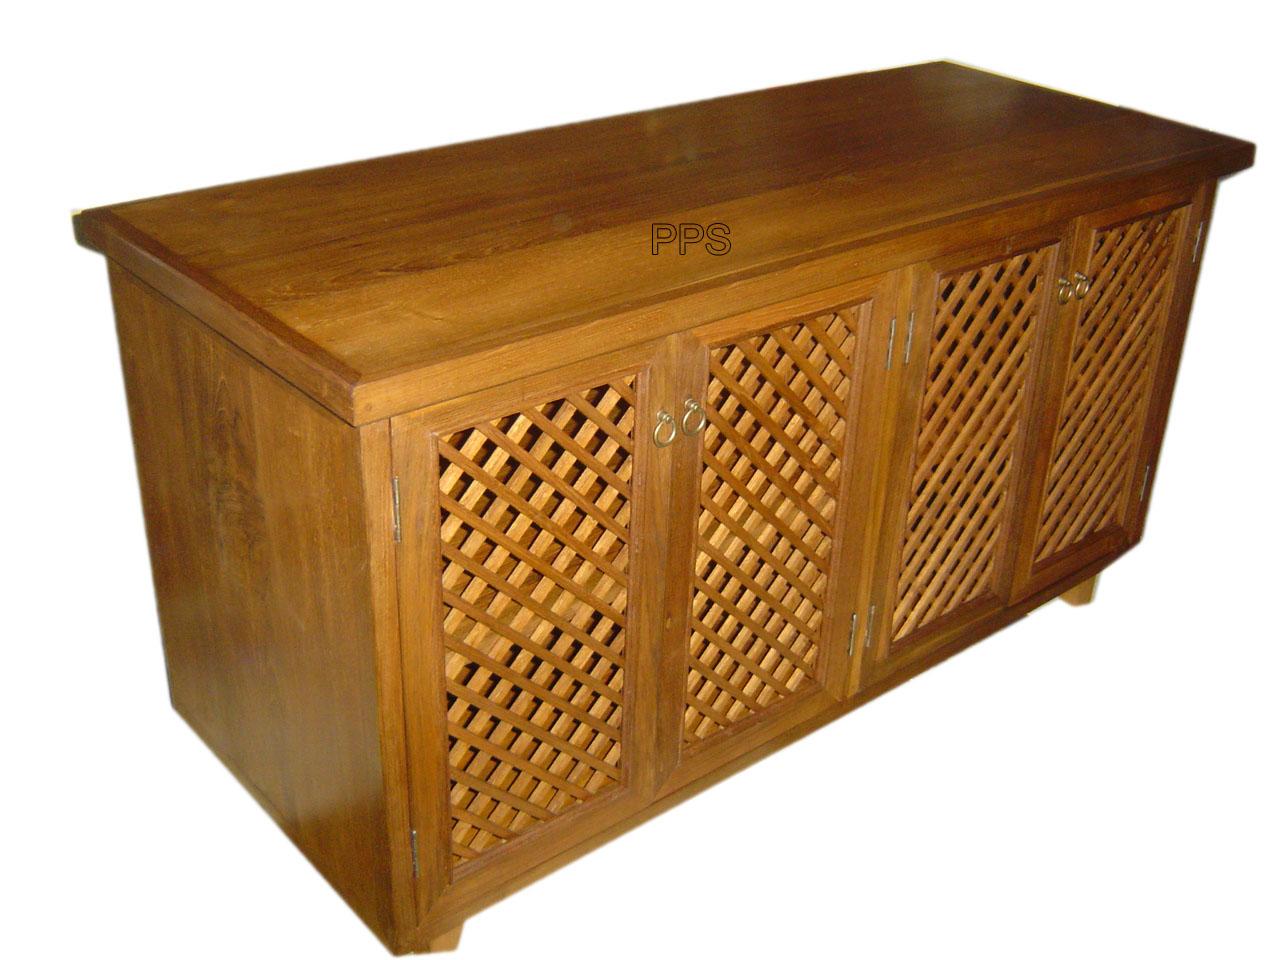 PS-Wood Shelf (sn349)